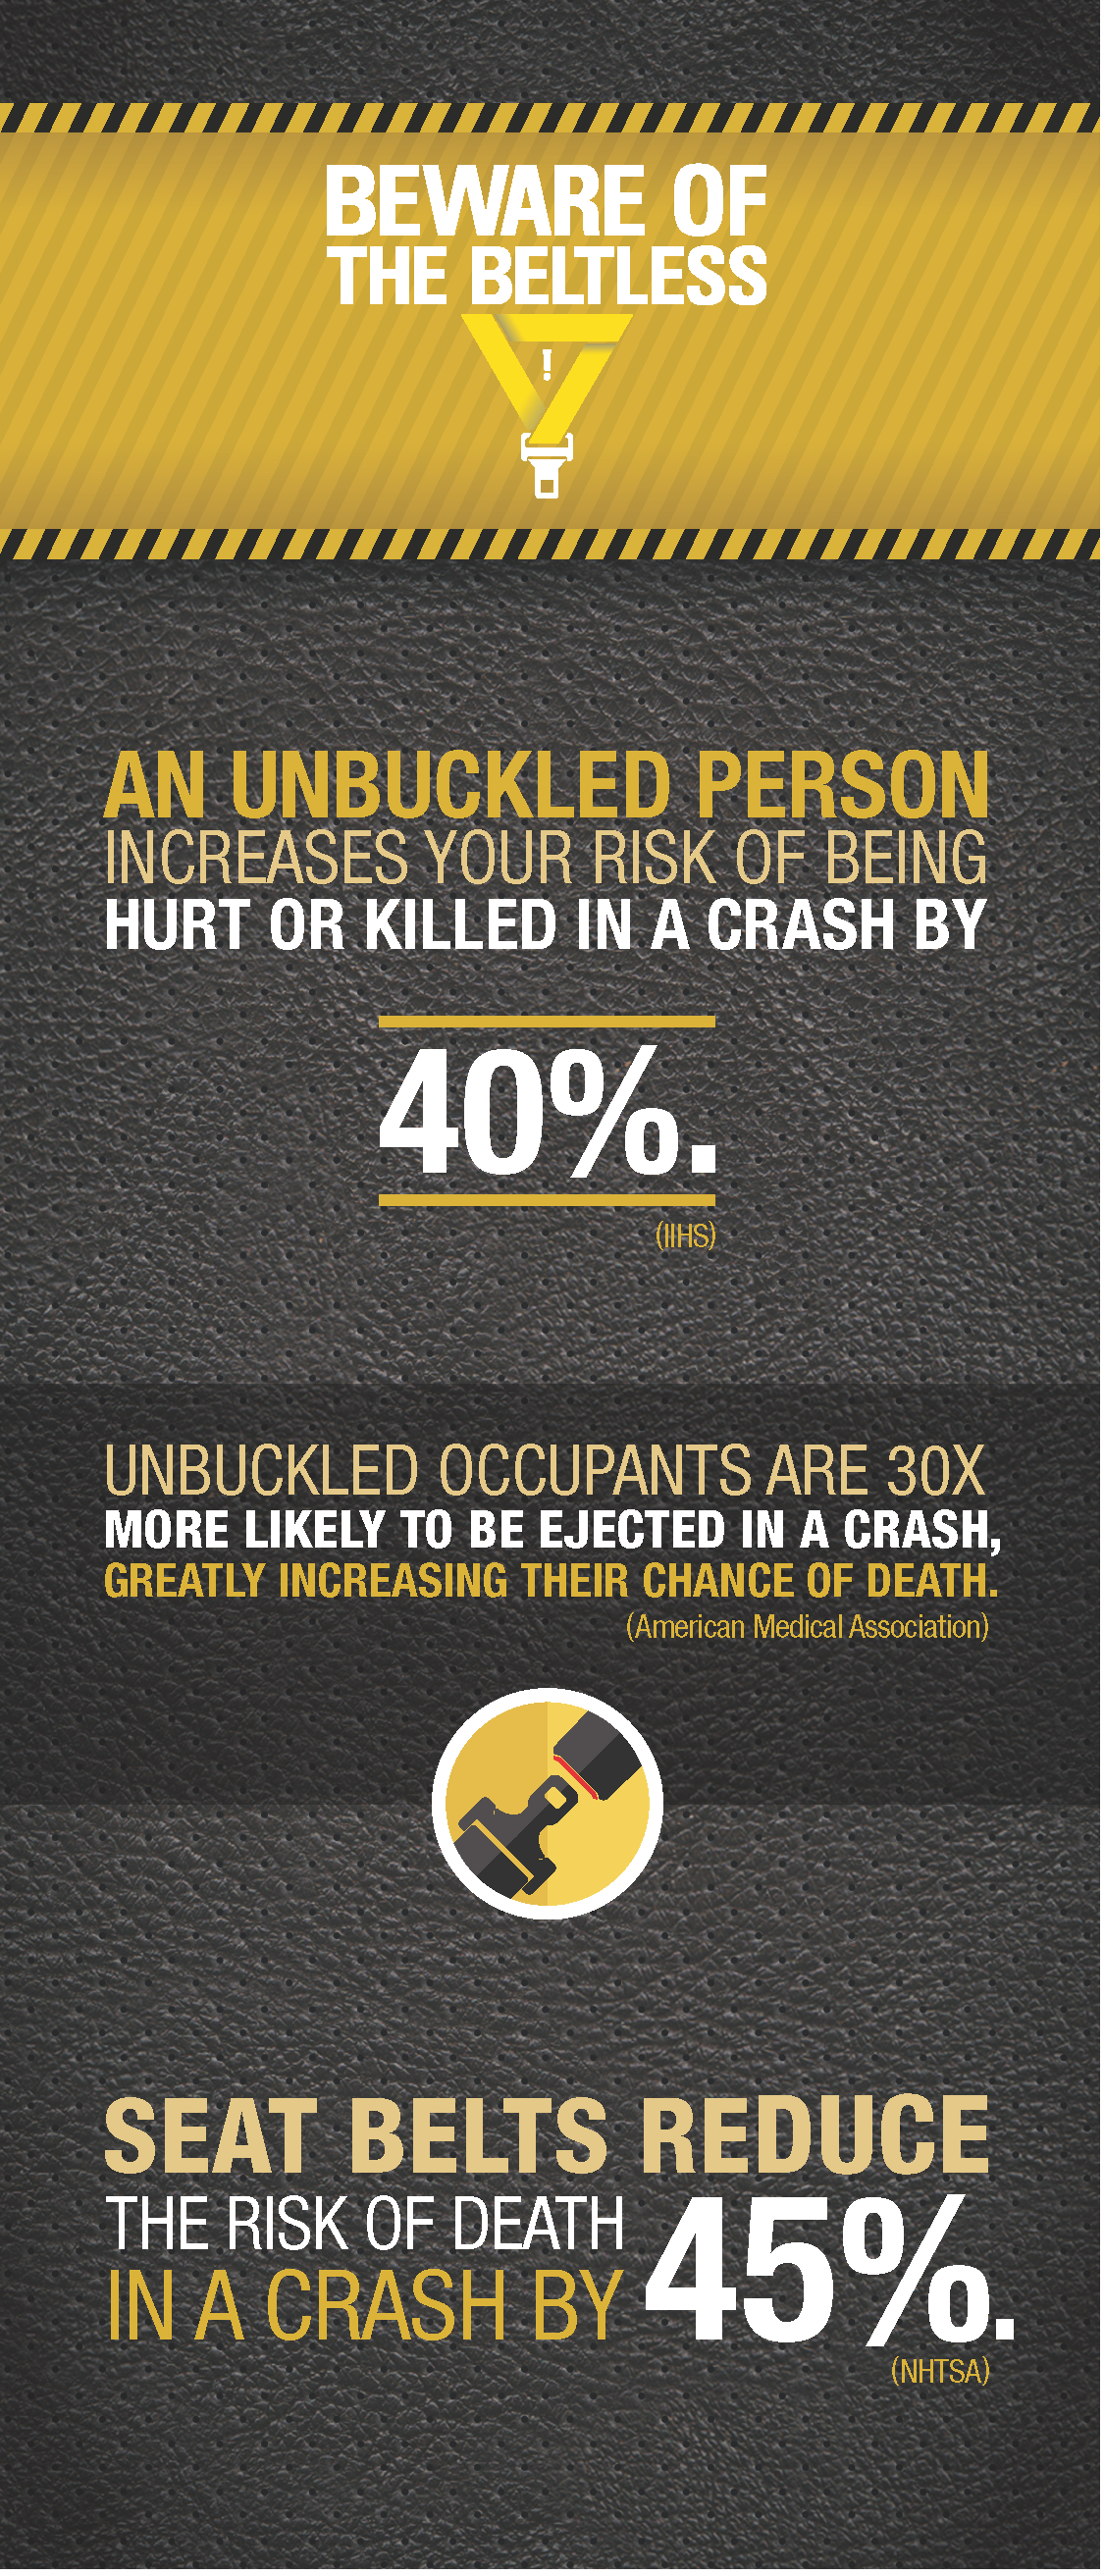 seat belt stats card detail image